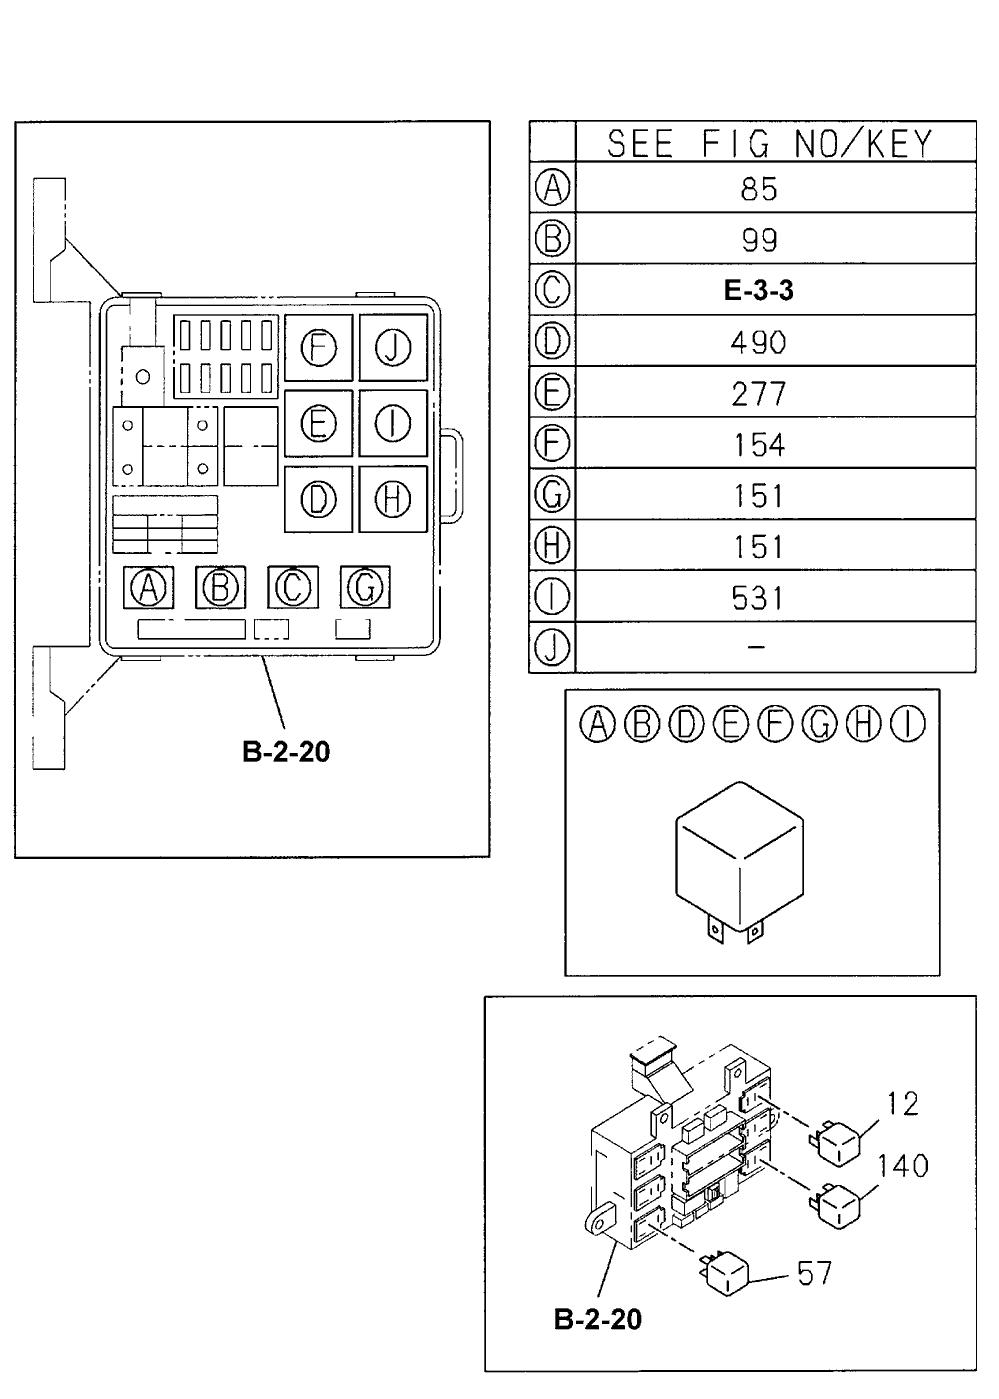 1999 honda passport 4 door 4ex kl 4at fuse box relay (engine) 2011 honda civic fuse box diagram 1999 honda passport fuse box diagram #1